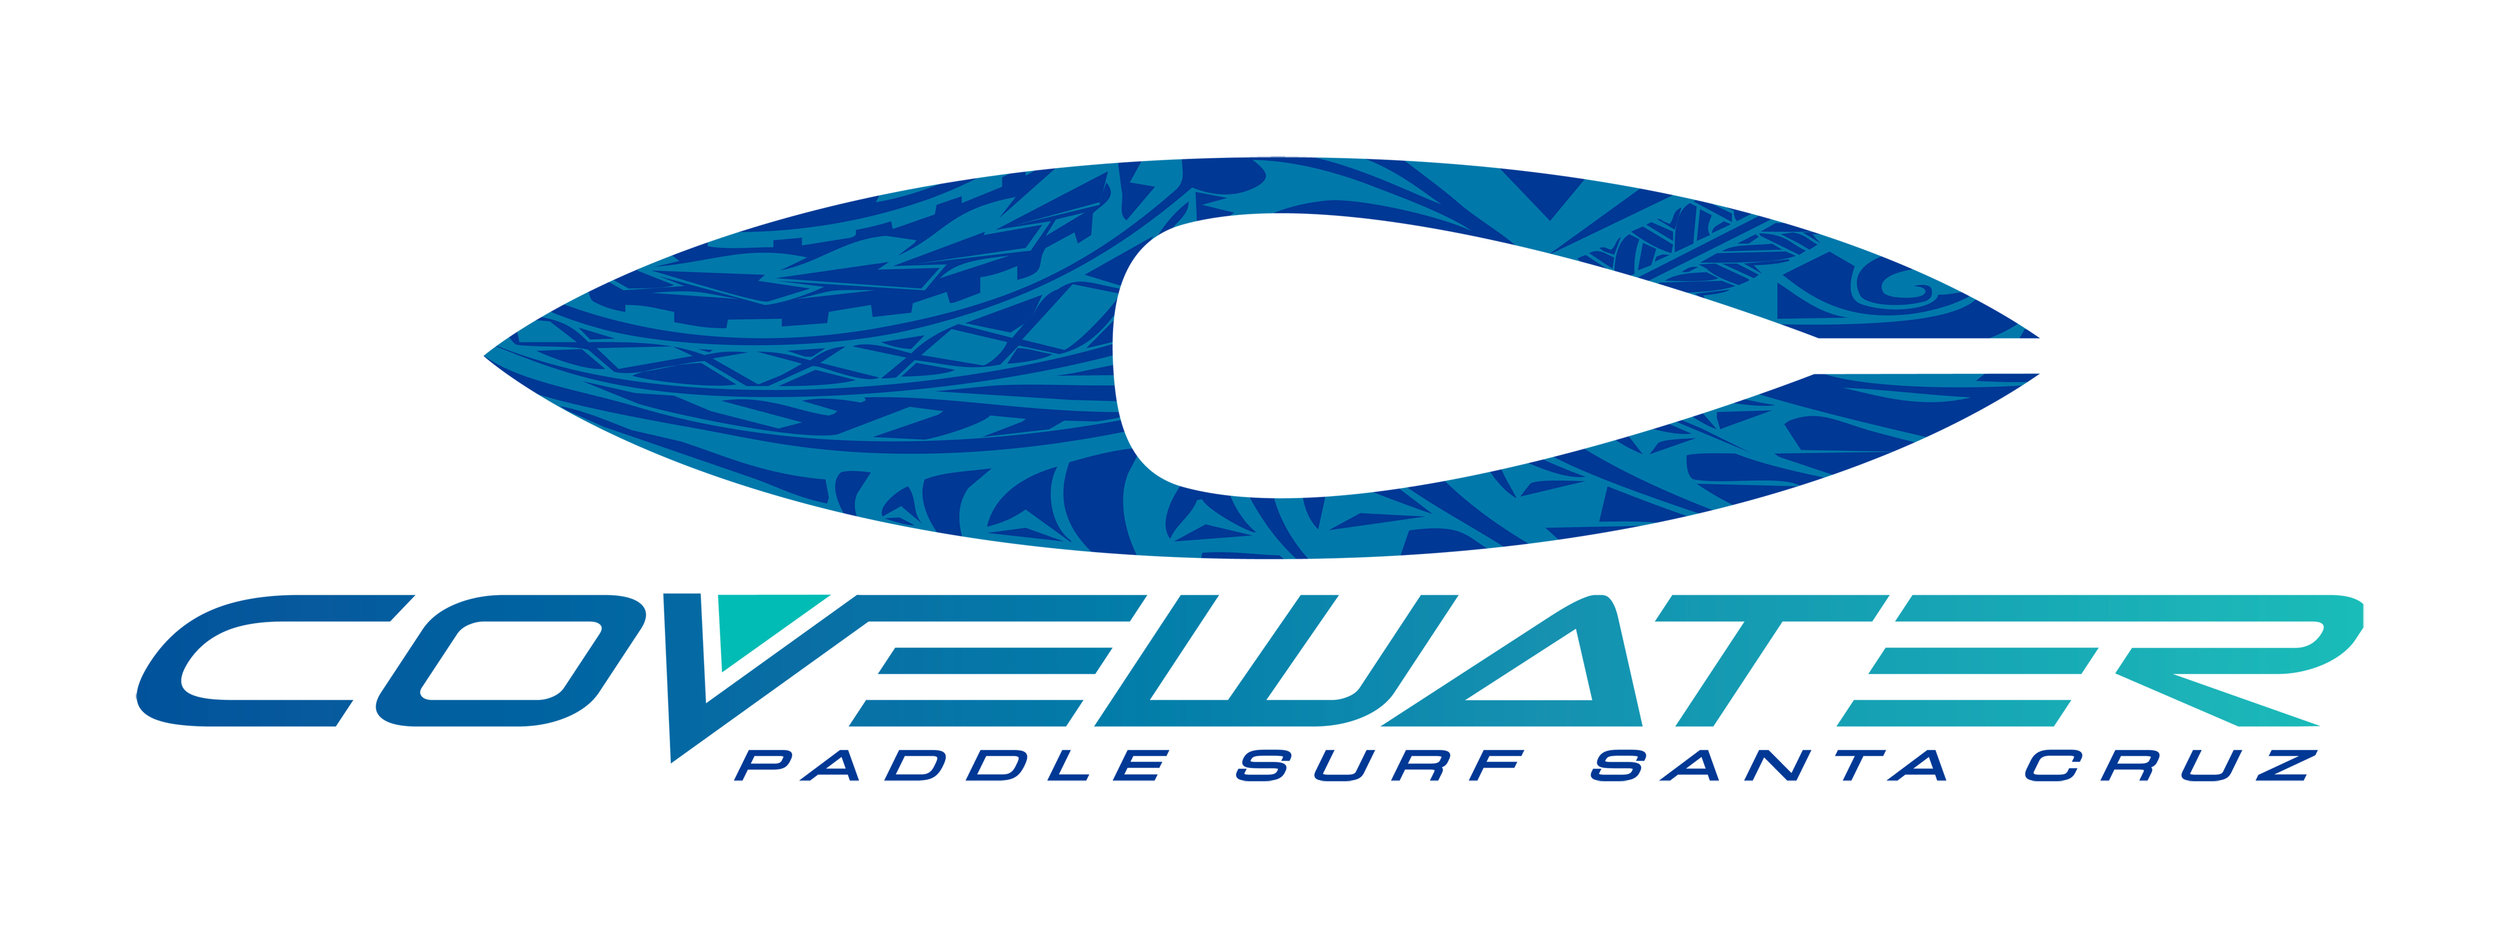 Covewater-logo-large.jpg